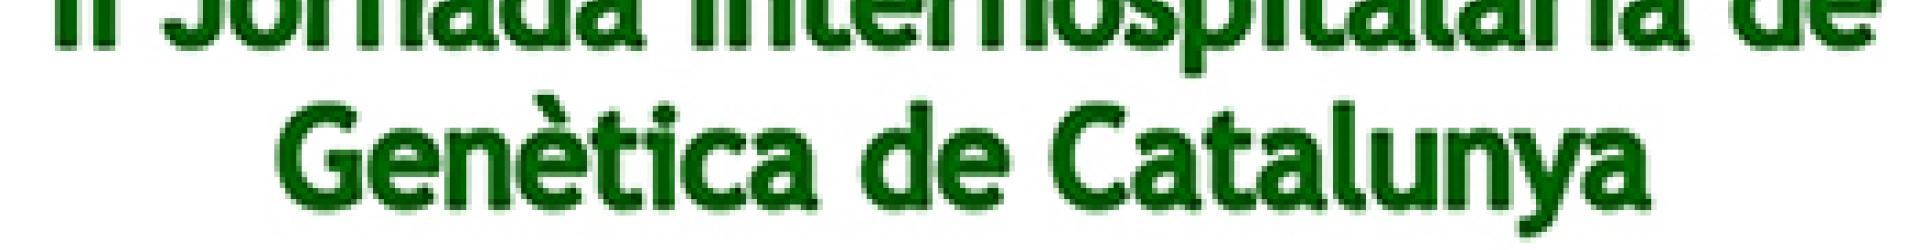 II Jornada Interhospitalaria de Genética de Cataluña